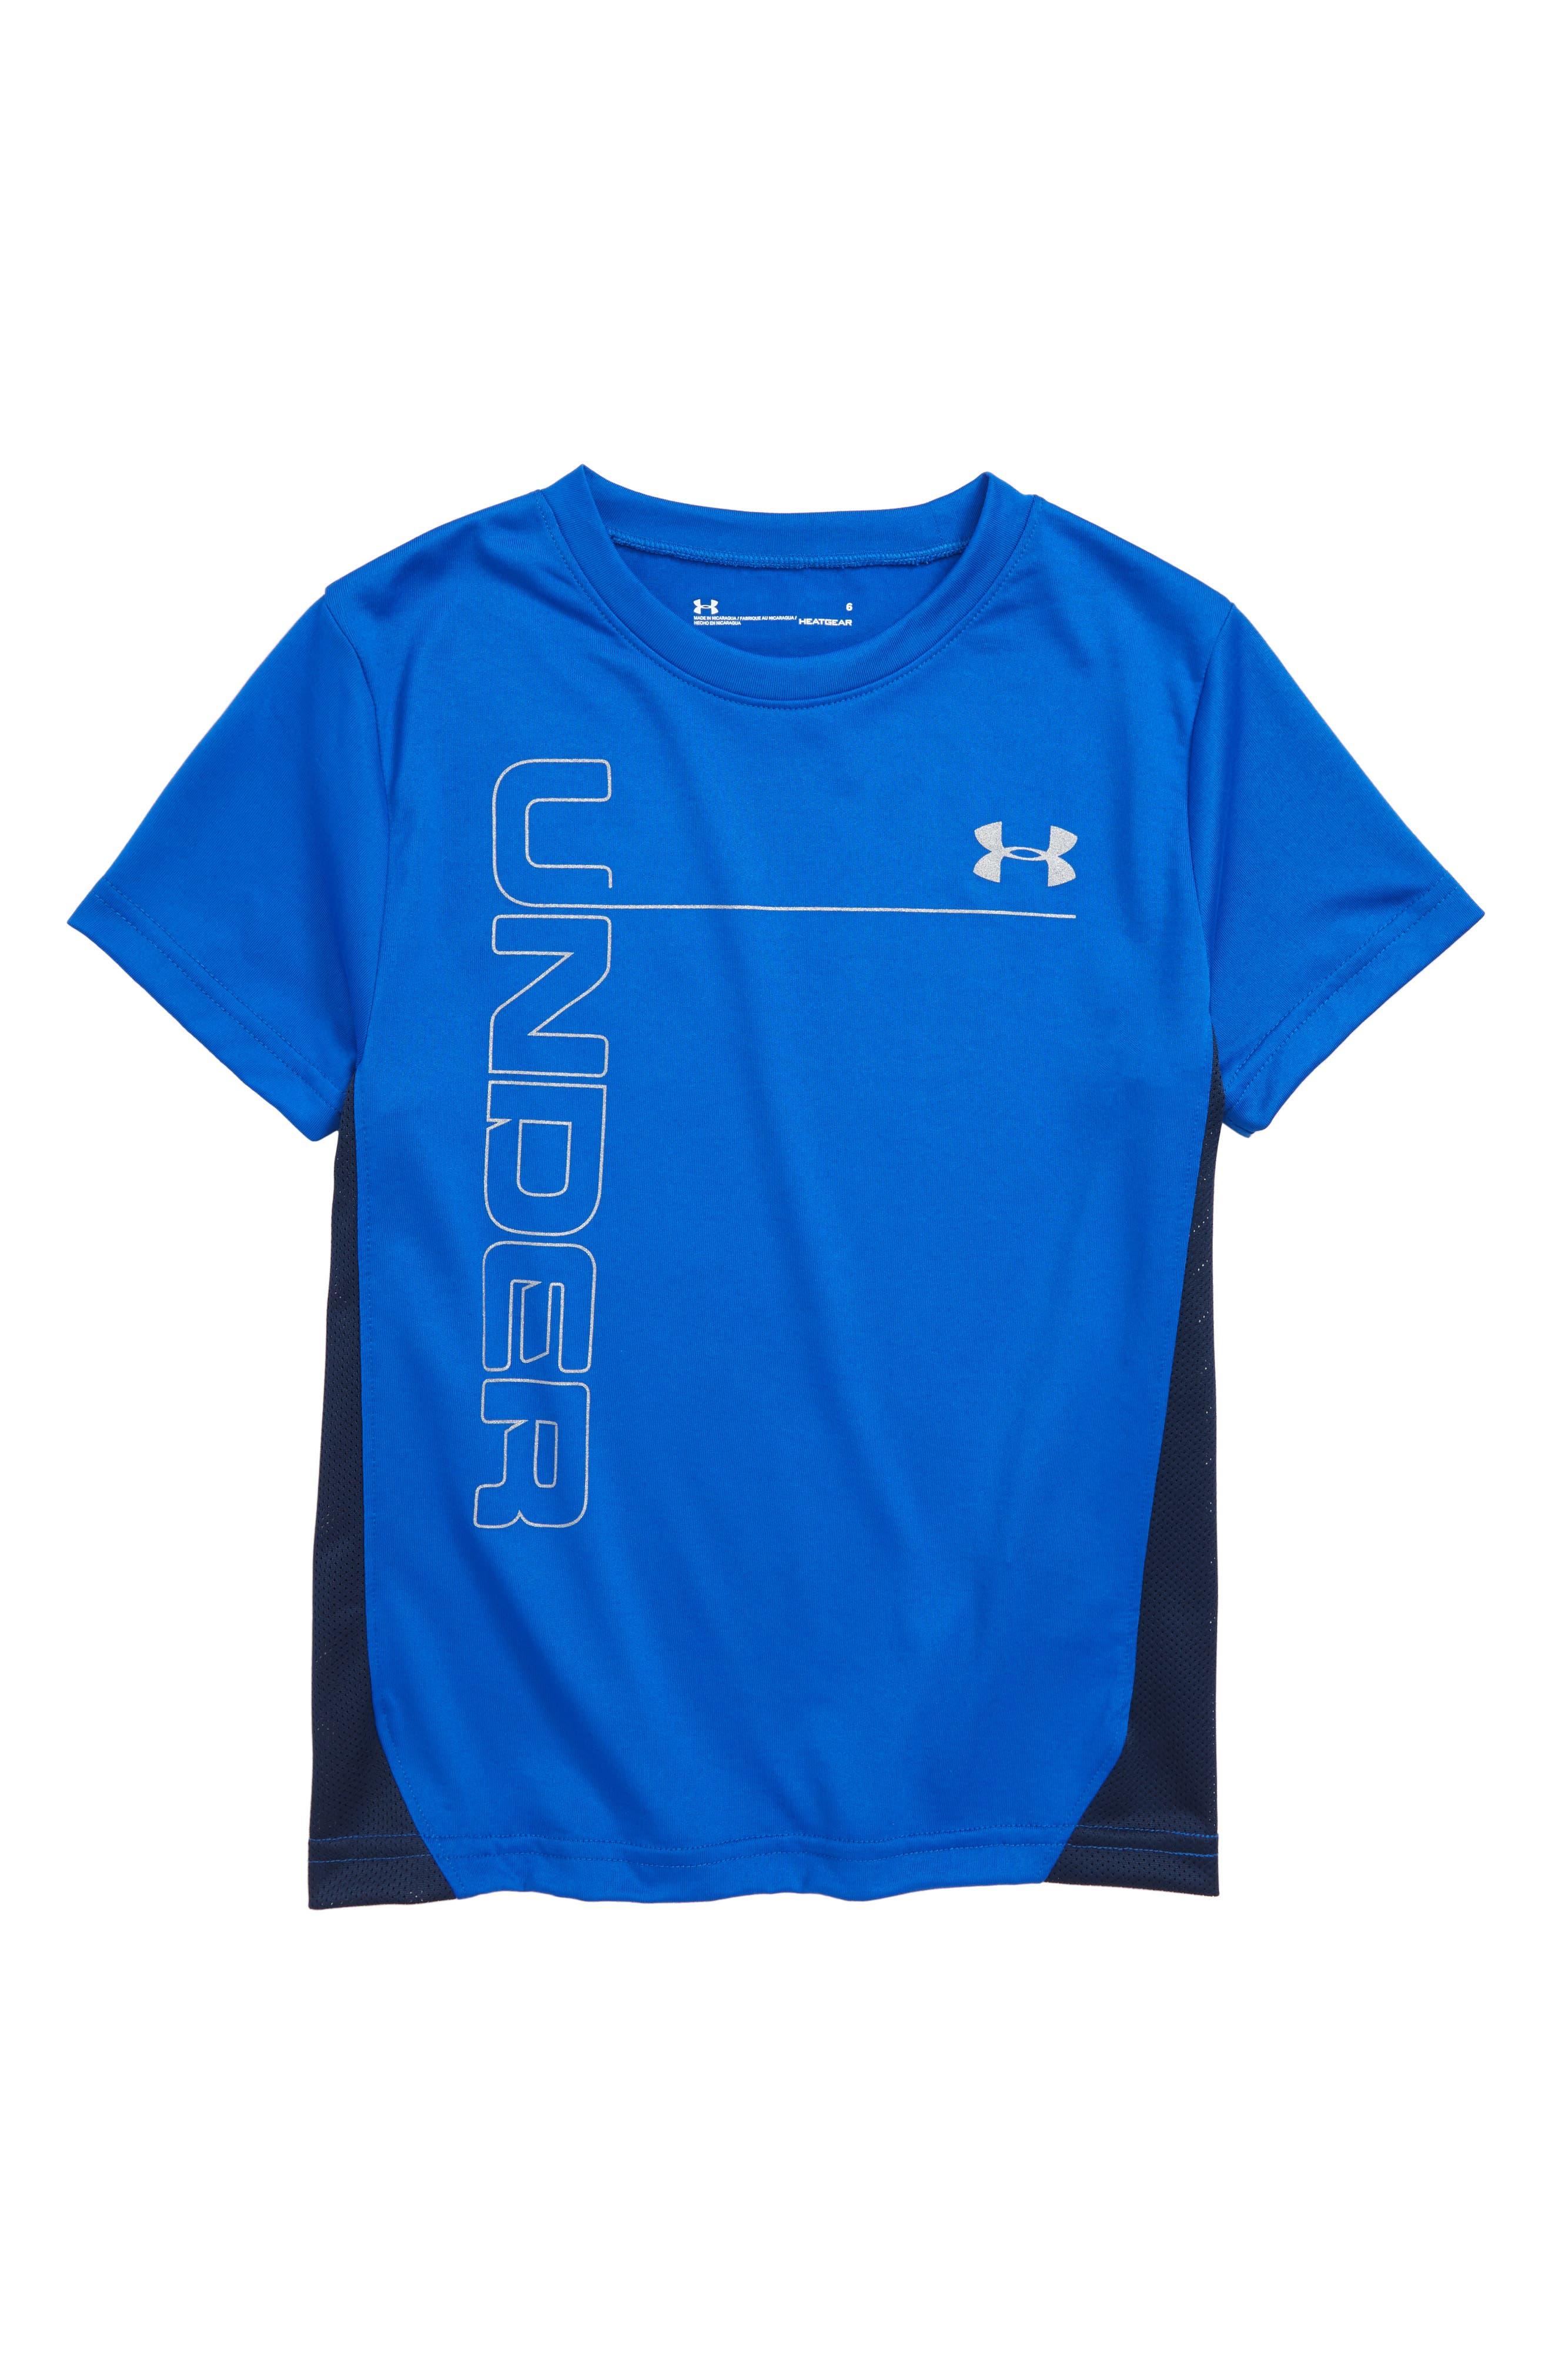 Mesh Tech HeatGear<sup>®</sup> T-Shirt,                             Main thumbnail 1, color,                             Ultra Blue